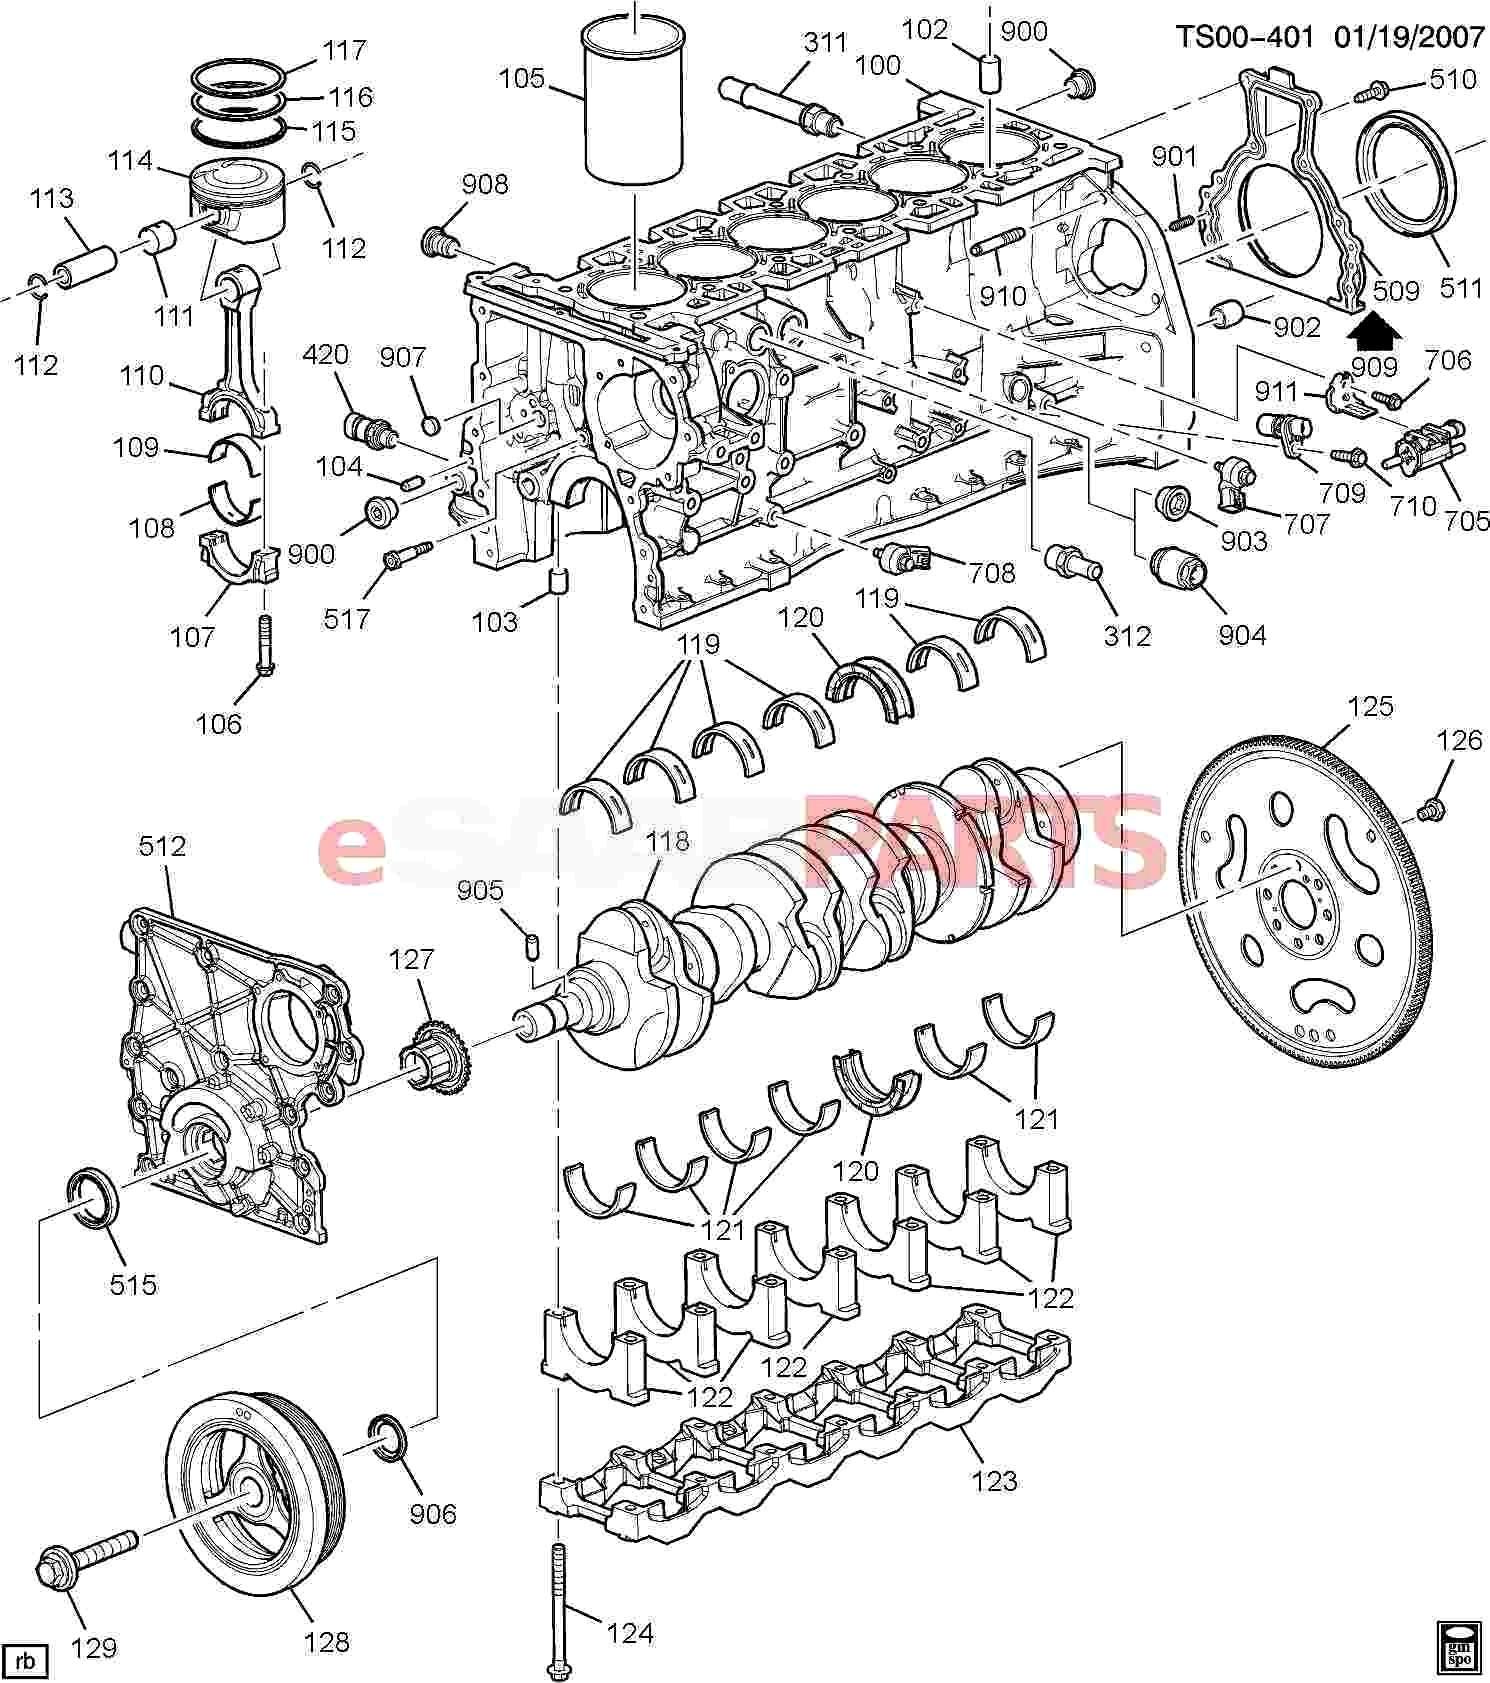 gm parts diagrams exploded views